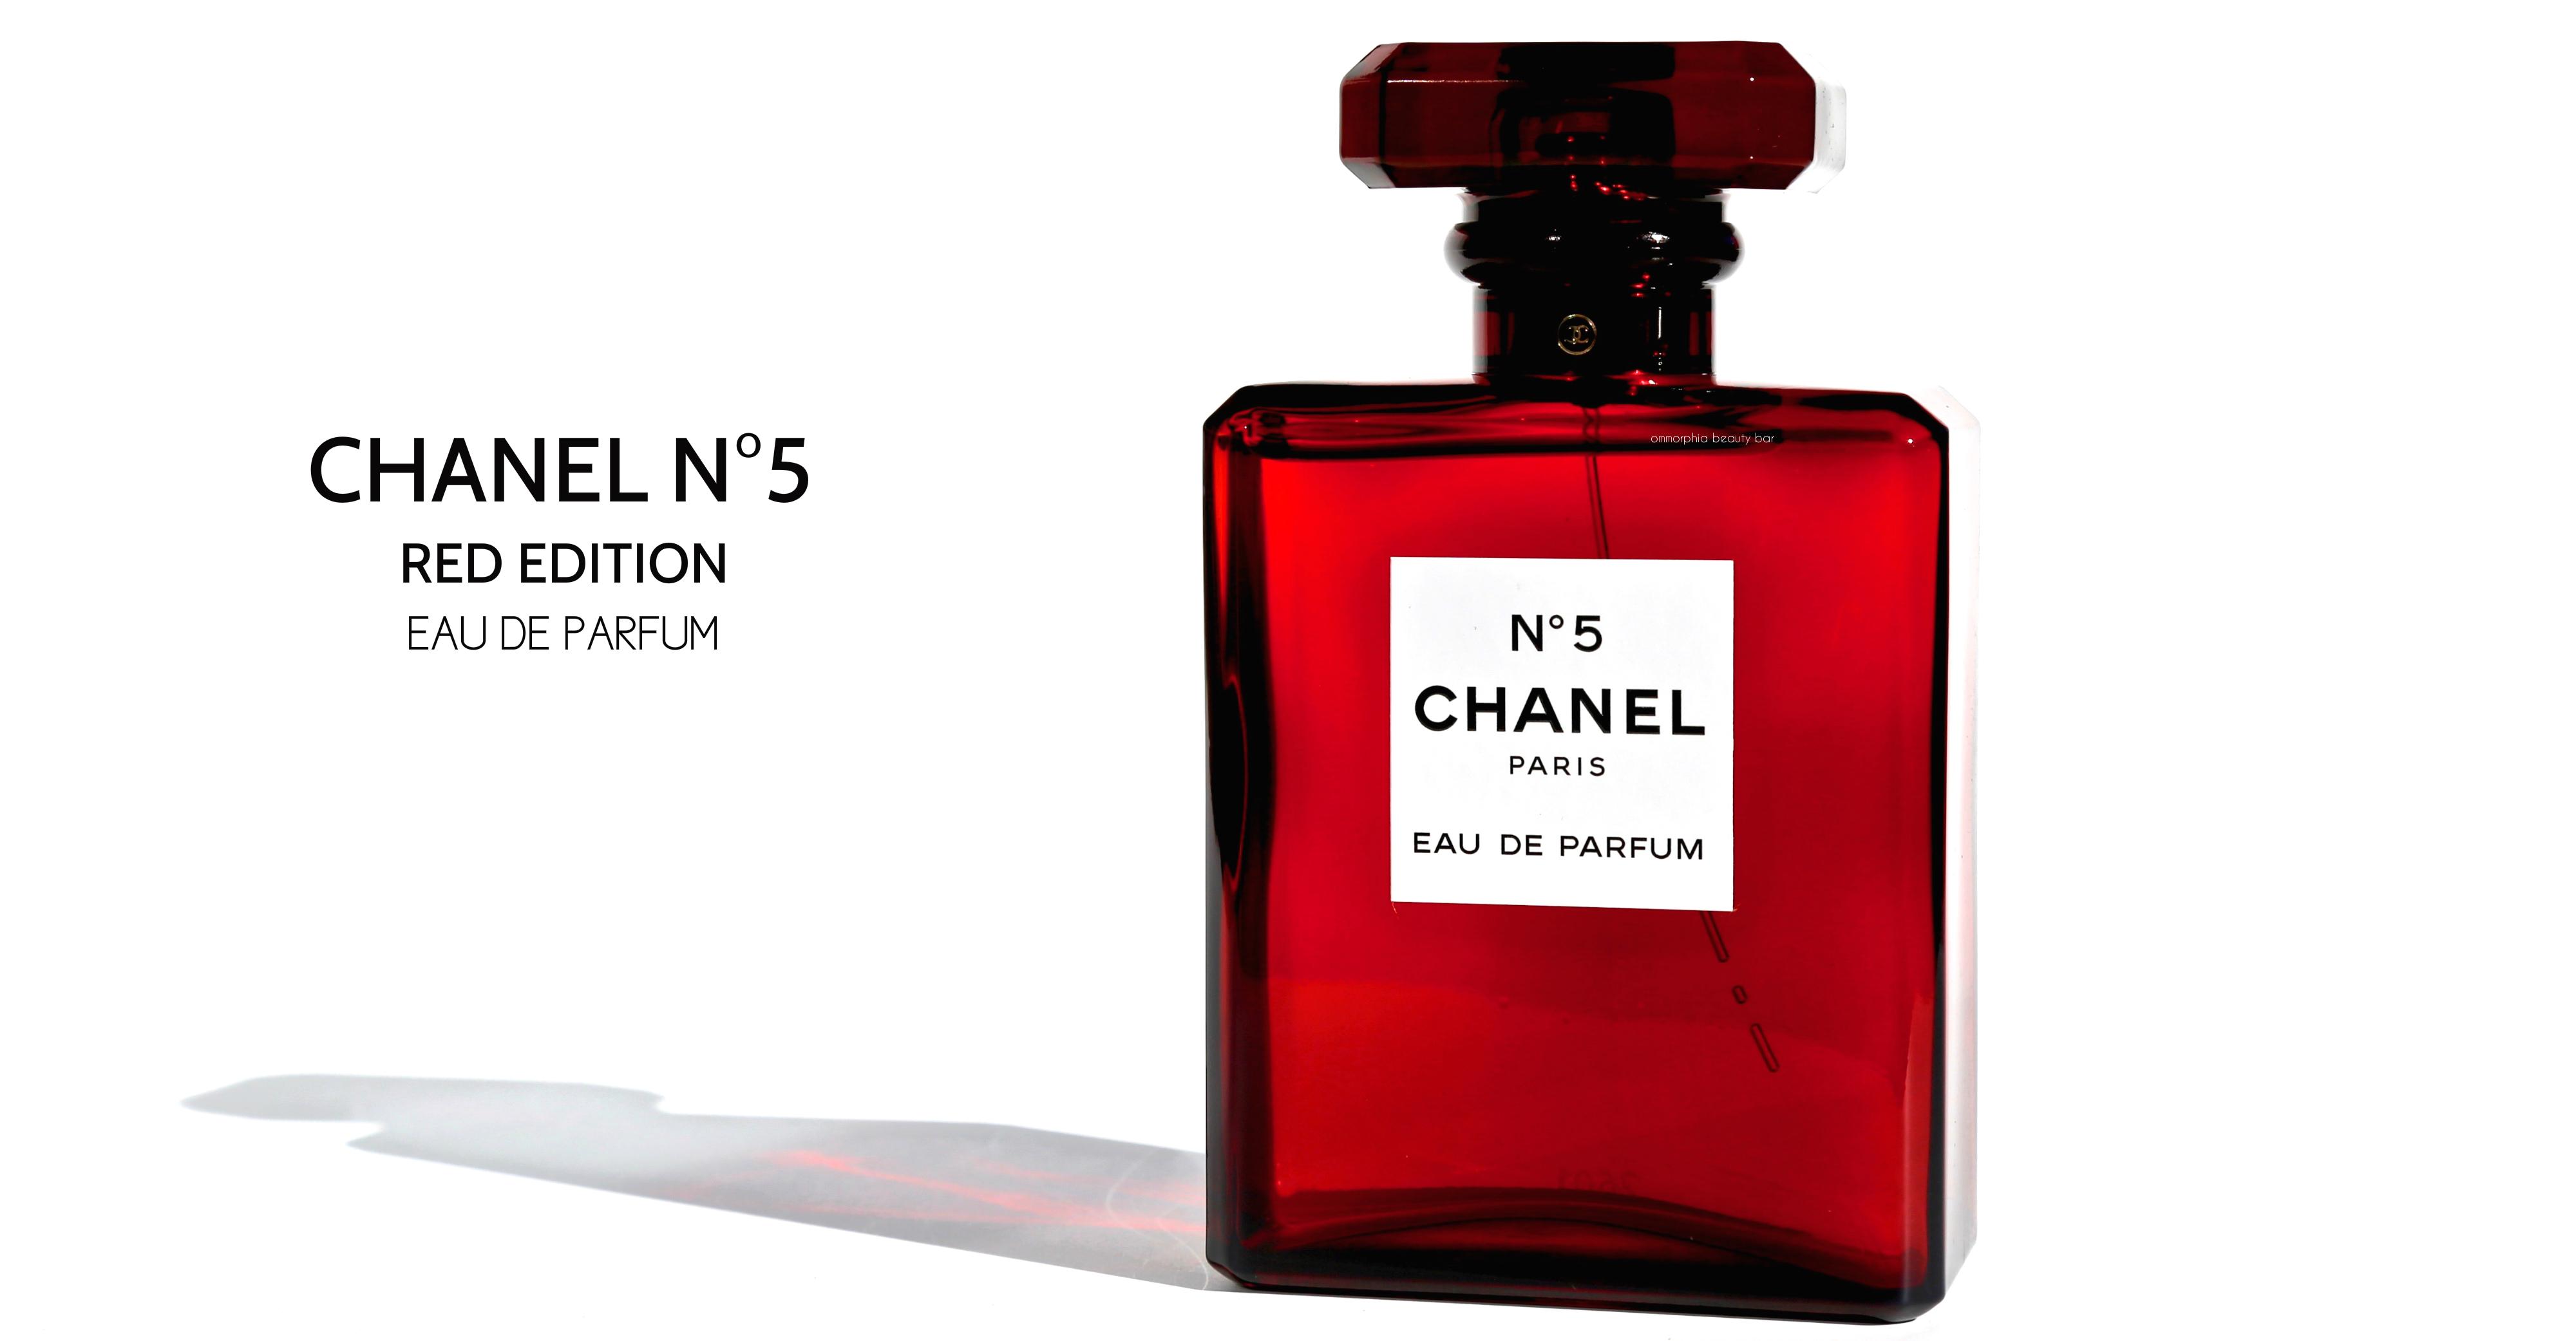 Chanel N5 Red Edition Eau De Parfum Ommorphia Beauty Bar